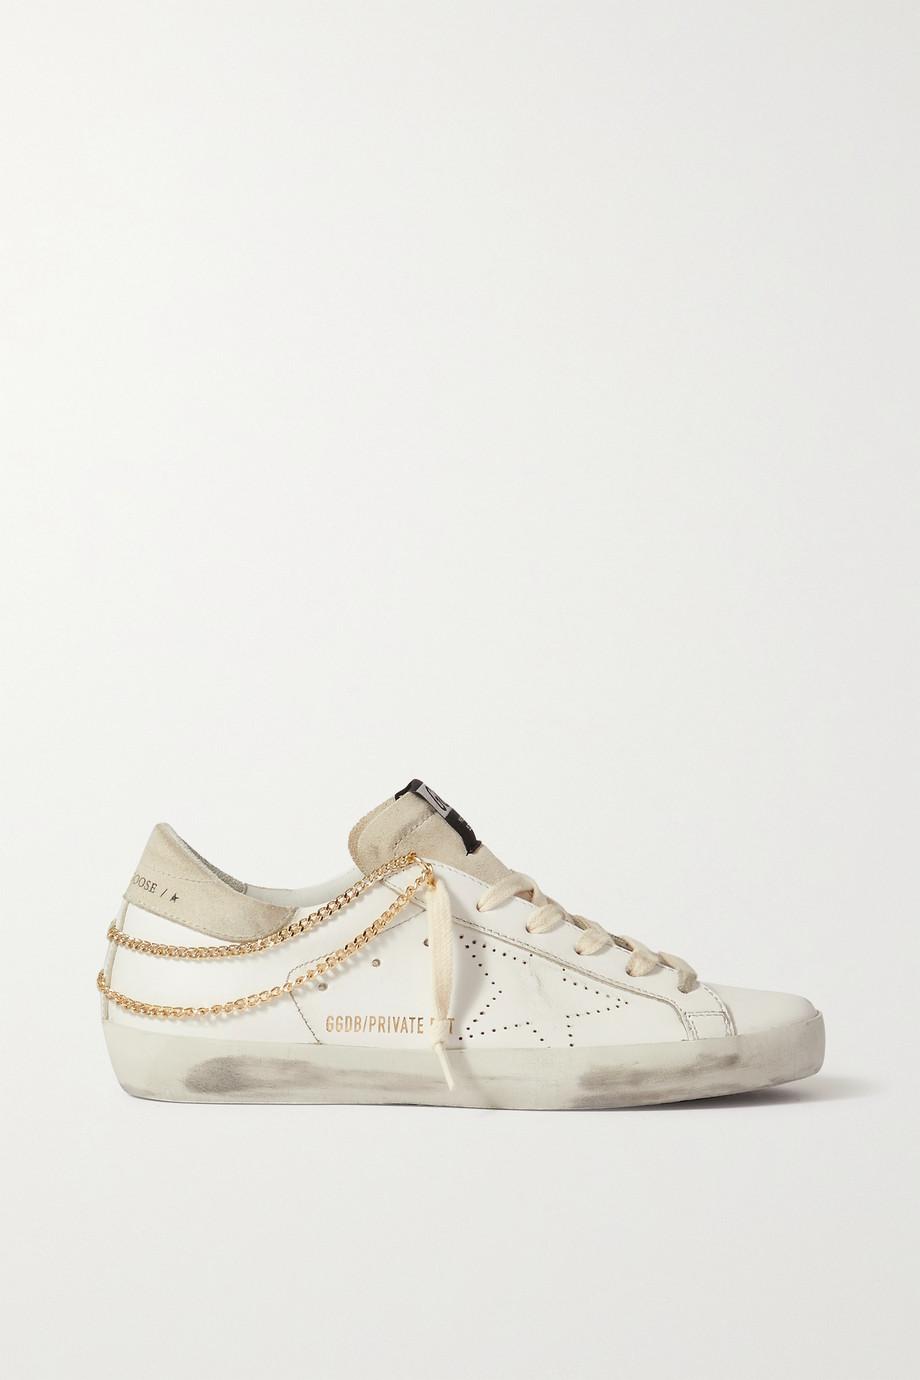 Golden Goose Superstar Sneakers aus Leder und Veloursleder mit Ketten in Distressed-Optik